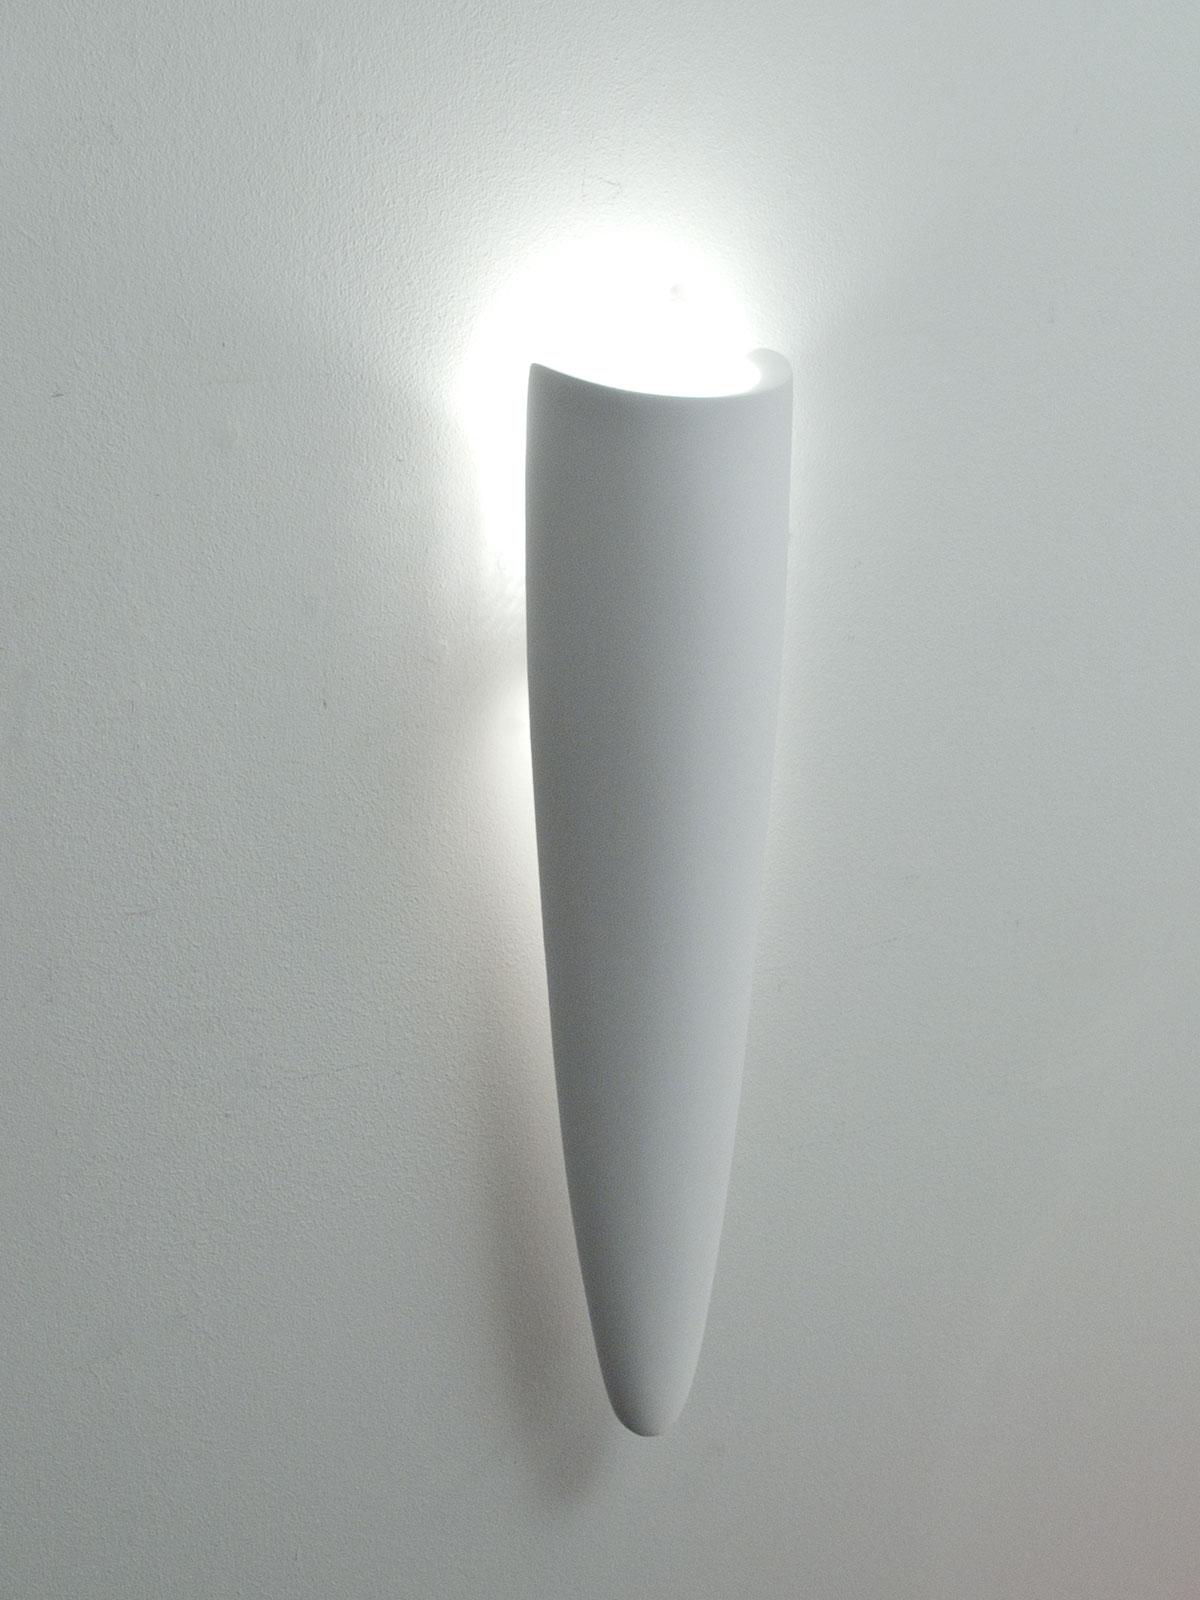 Wall Sconces Plaster : Plaster Wall Scones Joy Studio Design Gallery - Best Design